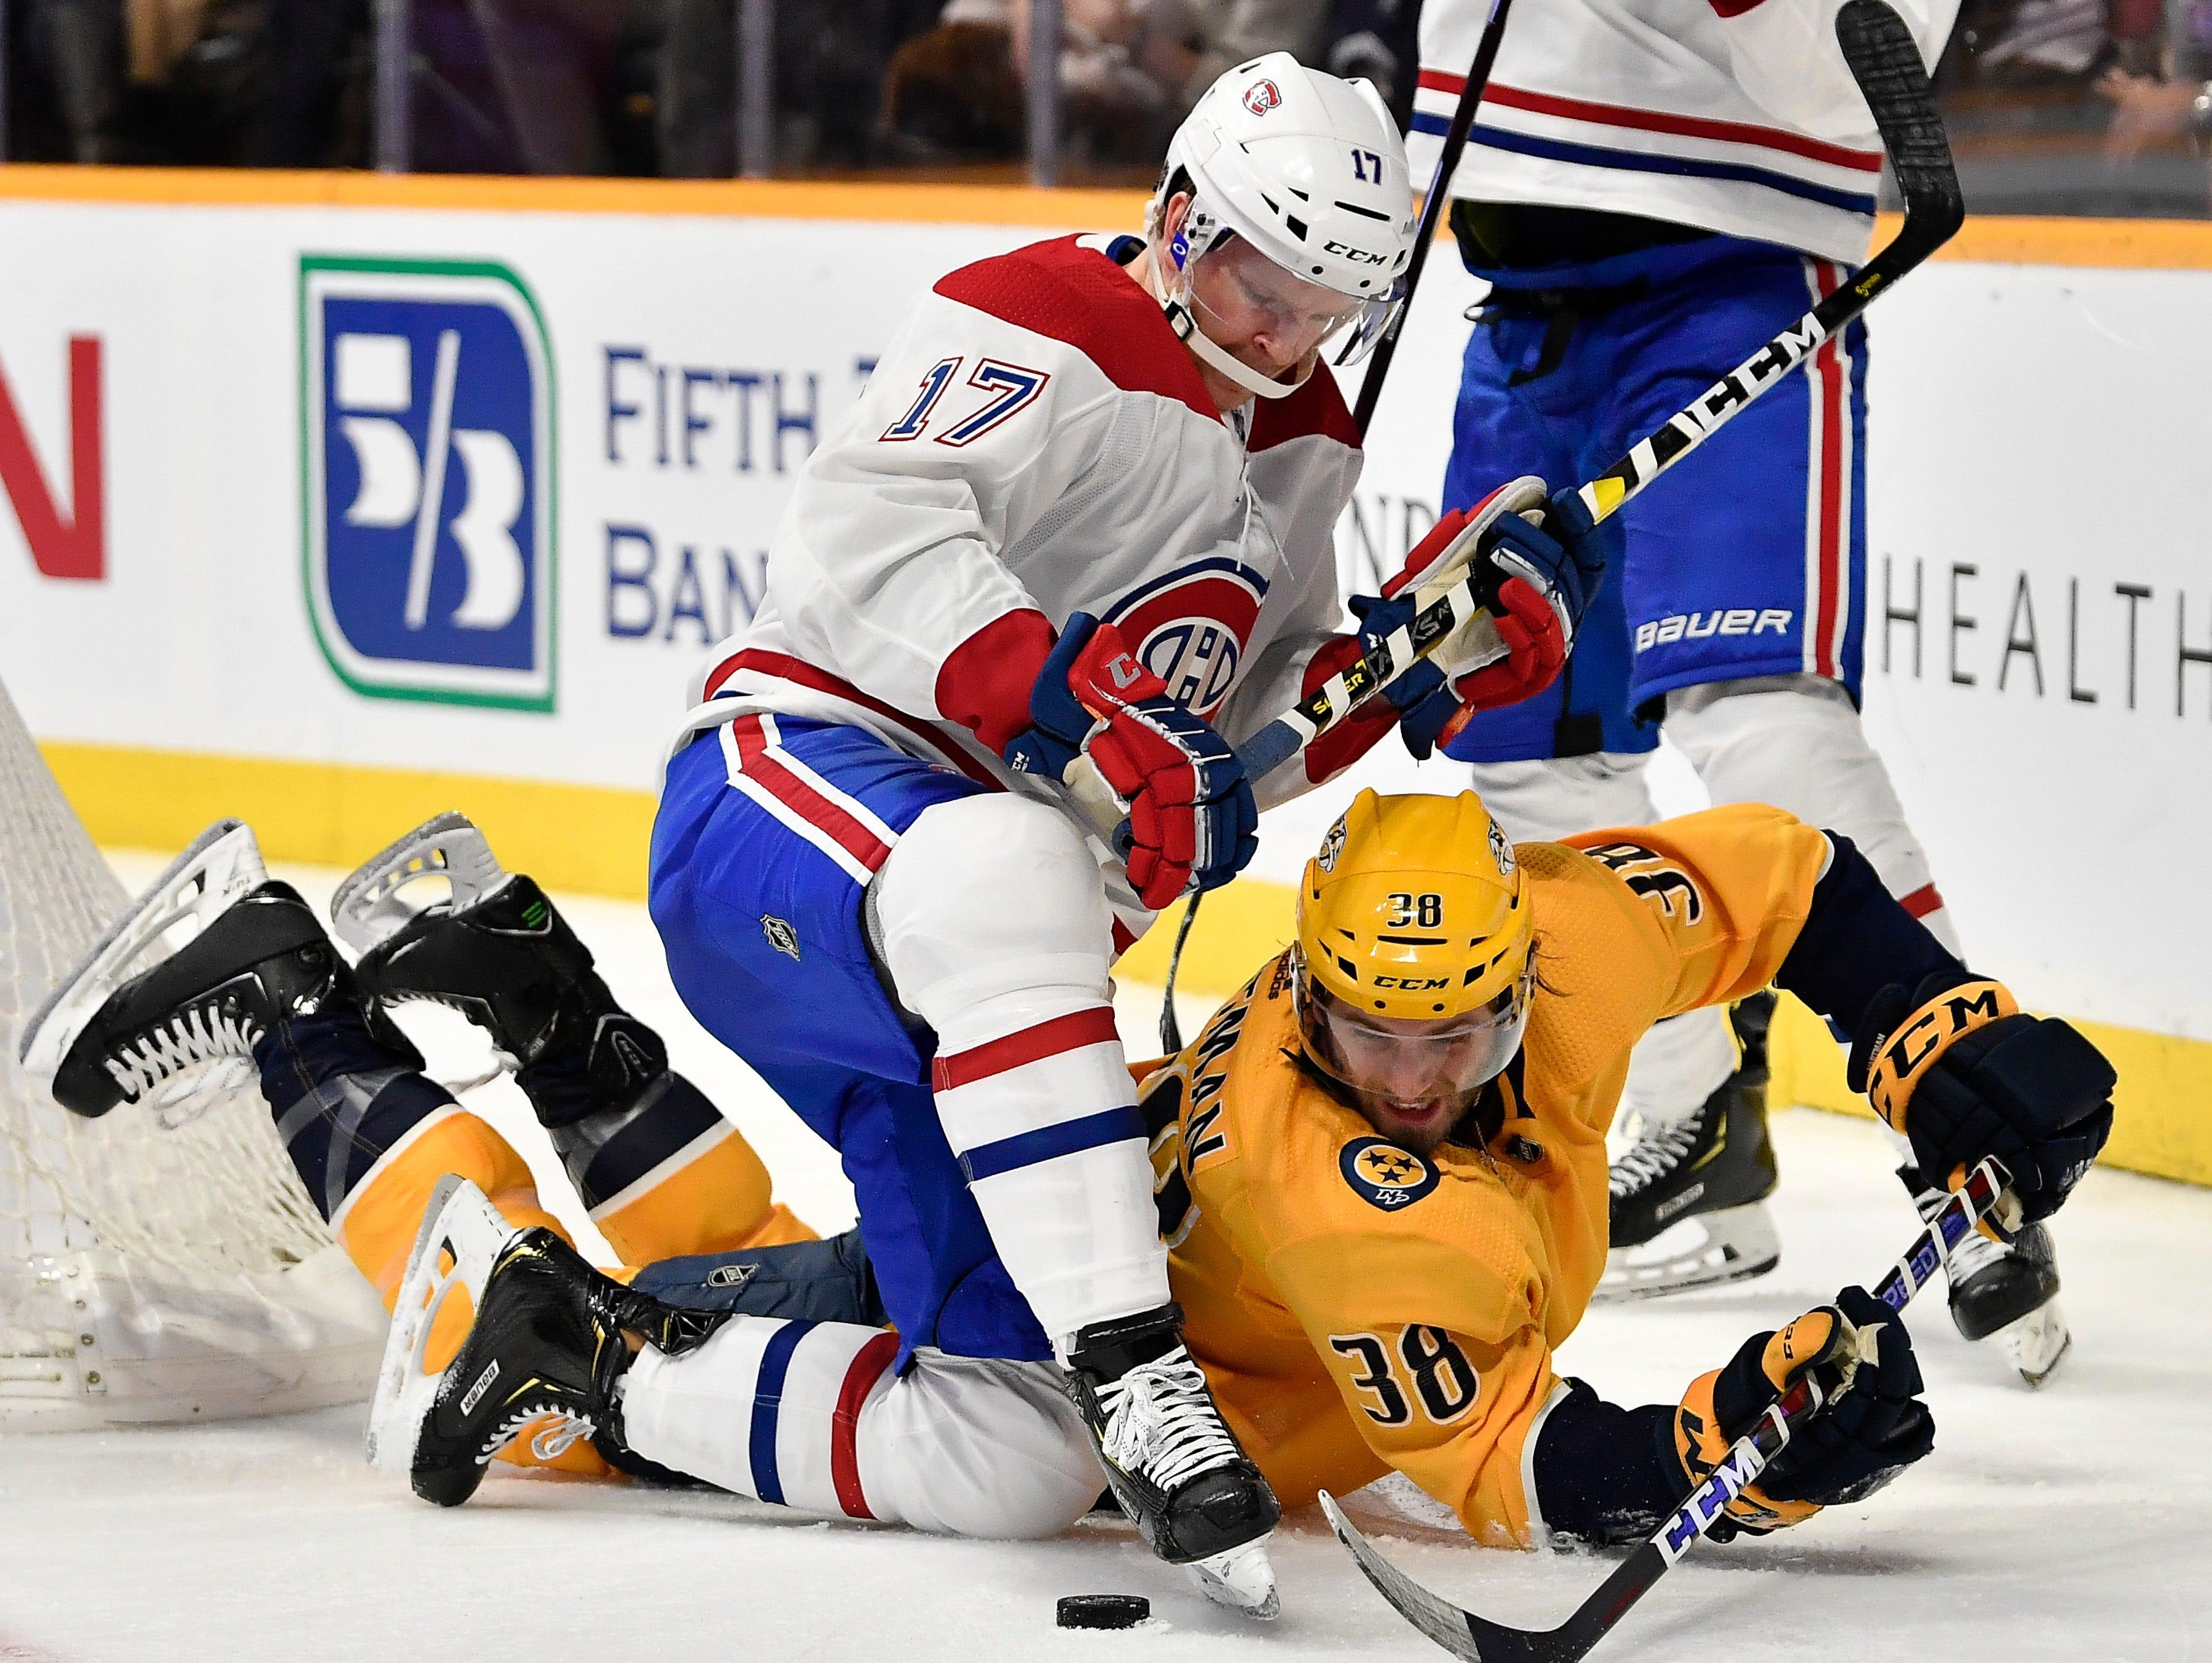 Predators right wing Ryan Hartman (38) battles for the puck with Canadiens defenseman Brett Kulak (17) during the third period at Bridgestone Arena Thursday, Feb. 14, 2019 in Nashville, Tenn.